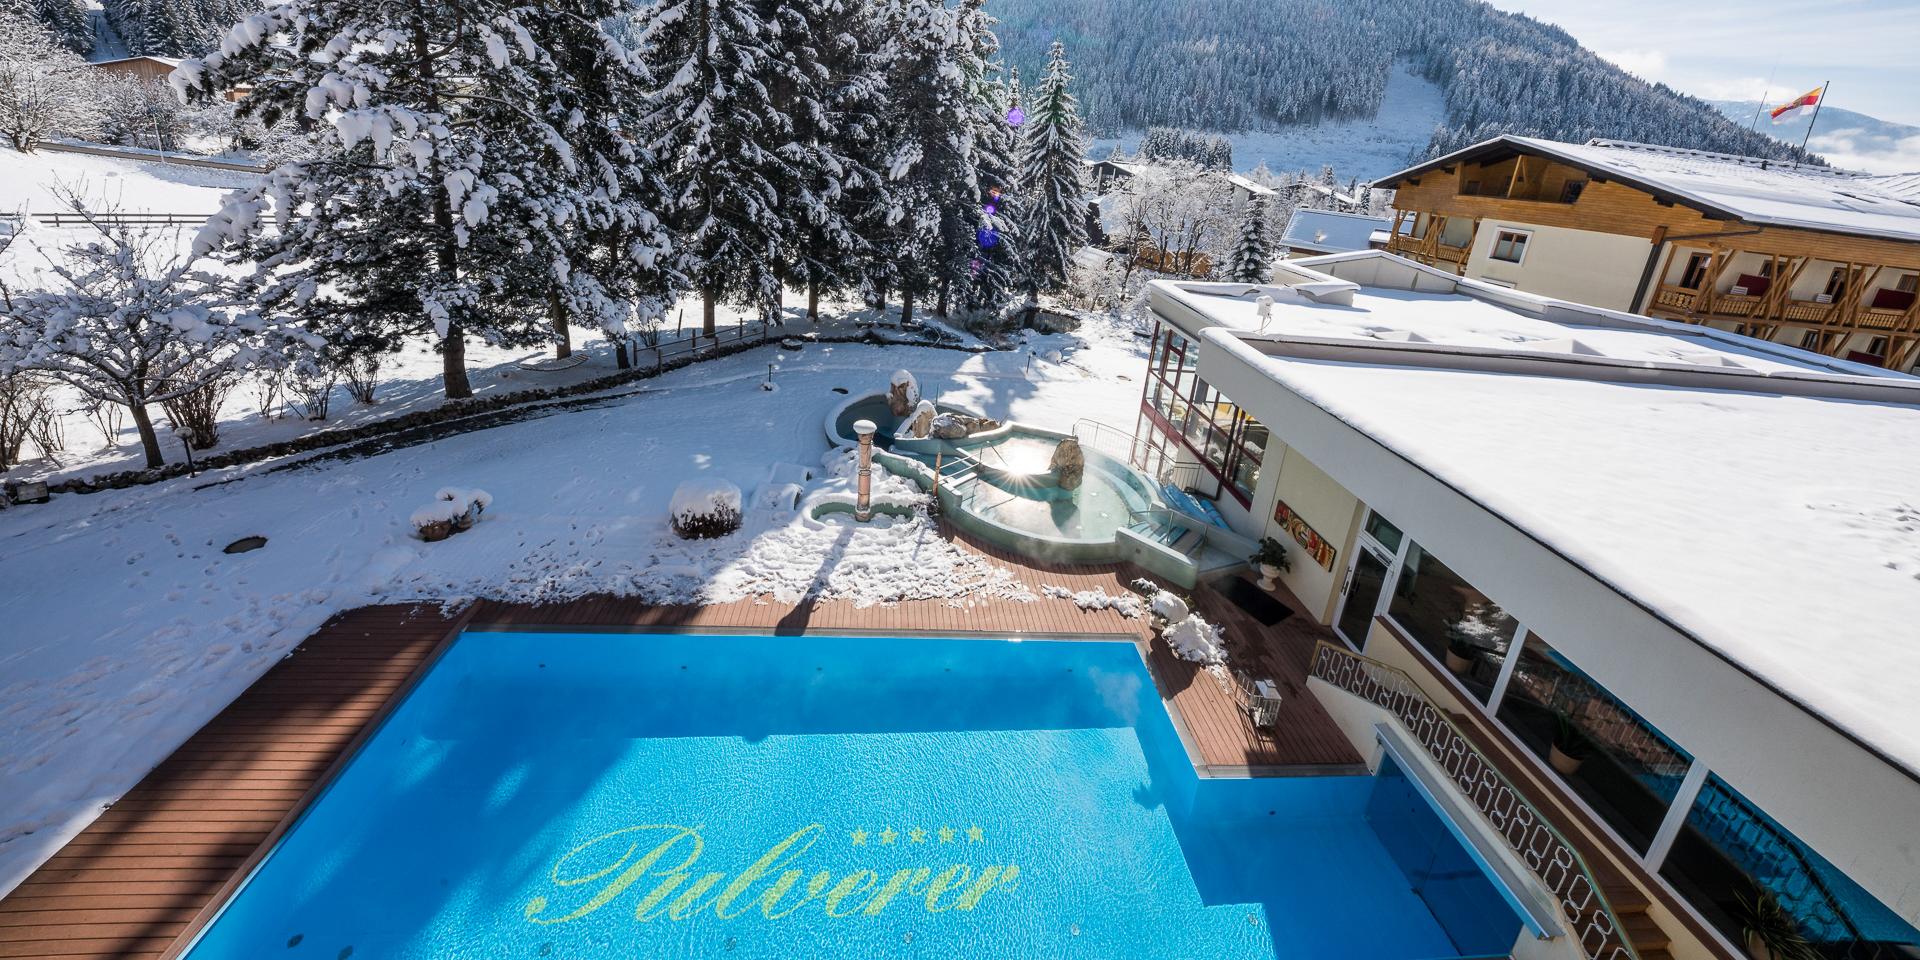 Schifahren, Winterwandern, Wellness, Therme, Kulinarik im Pulverer